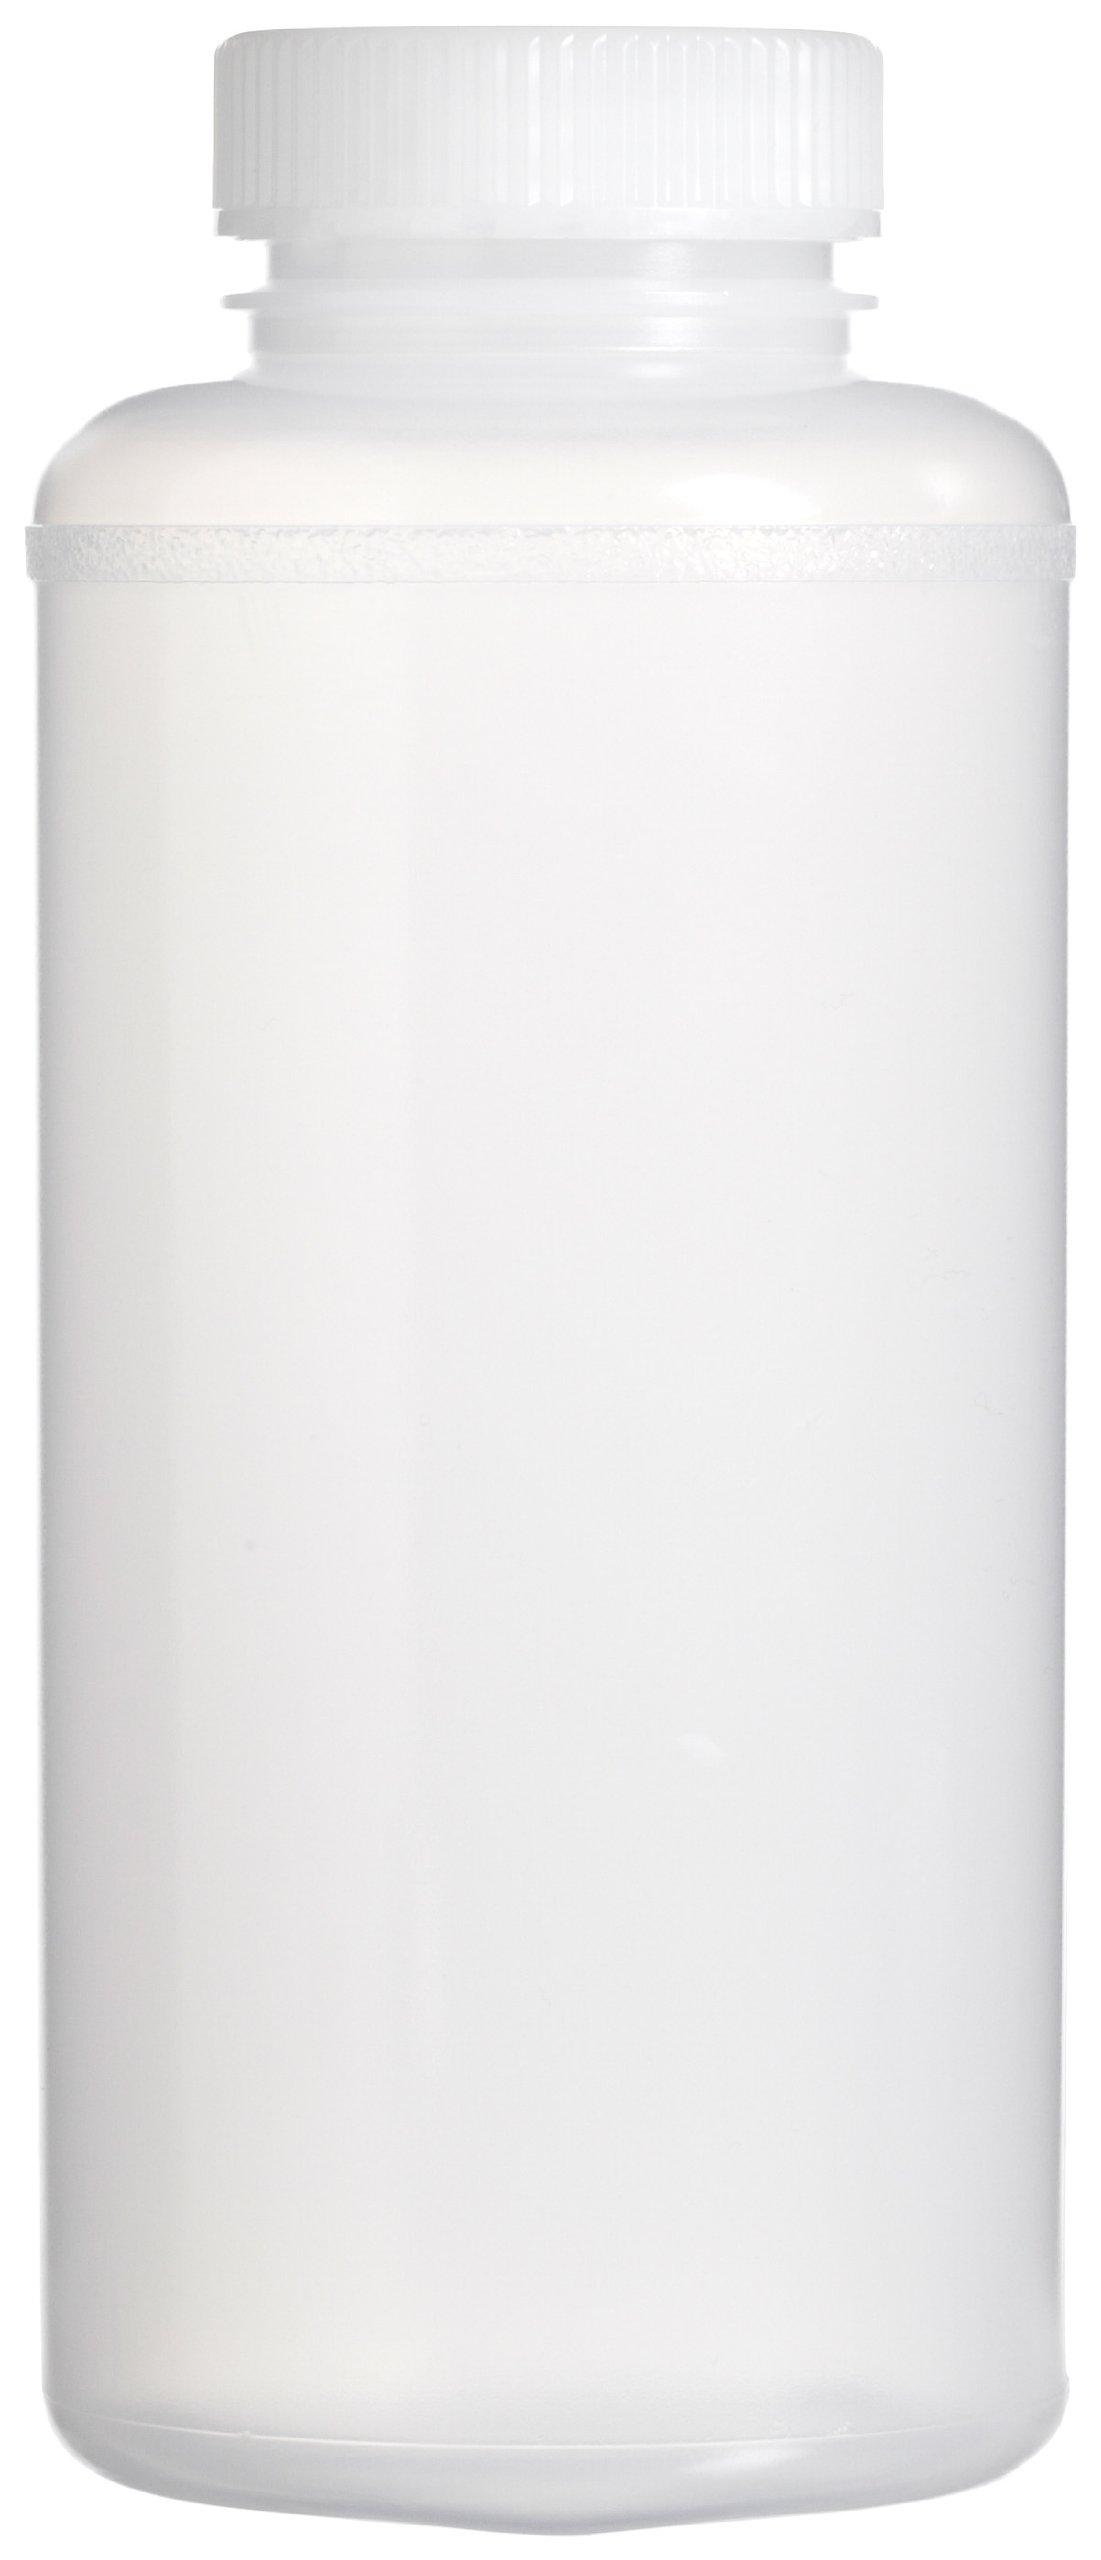 Bel-Art Precisionware Wide-Mouth 1000ml (32oz) Low-Density Polyethylene Bottles; Polypropylene Cap, 53mm Closure (Pack of 6) (F10626-0018)